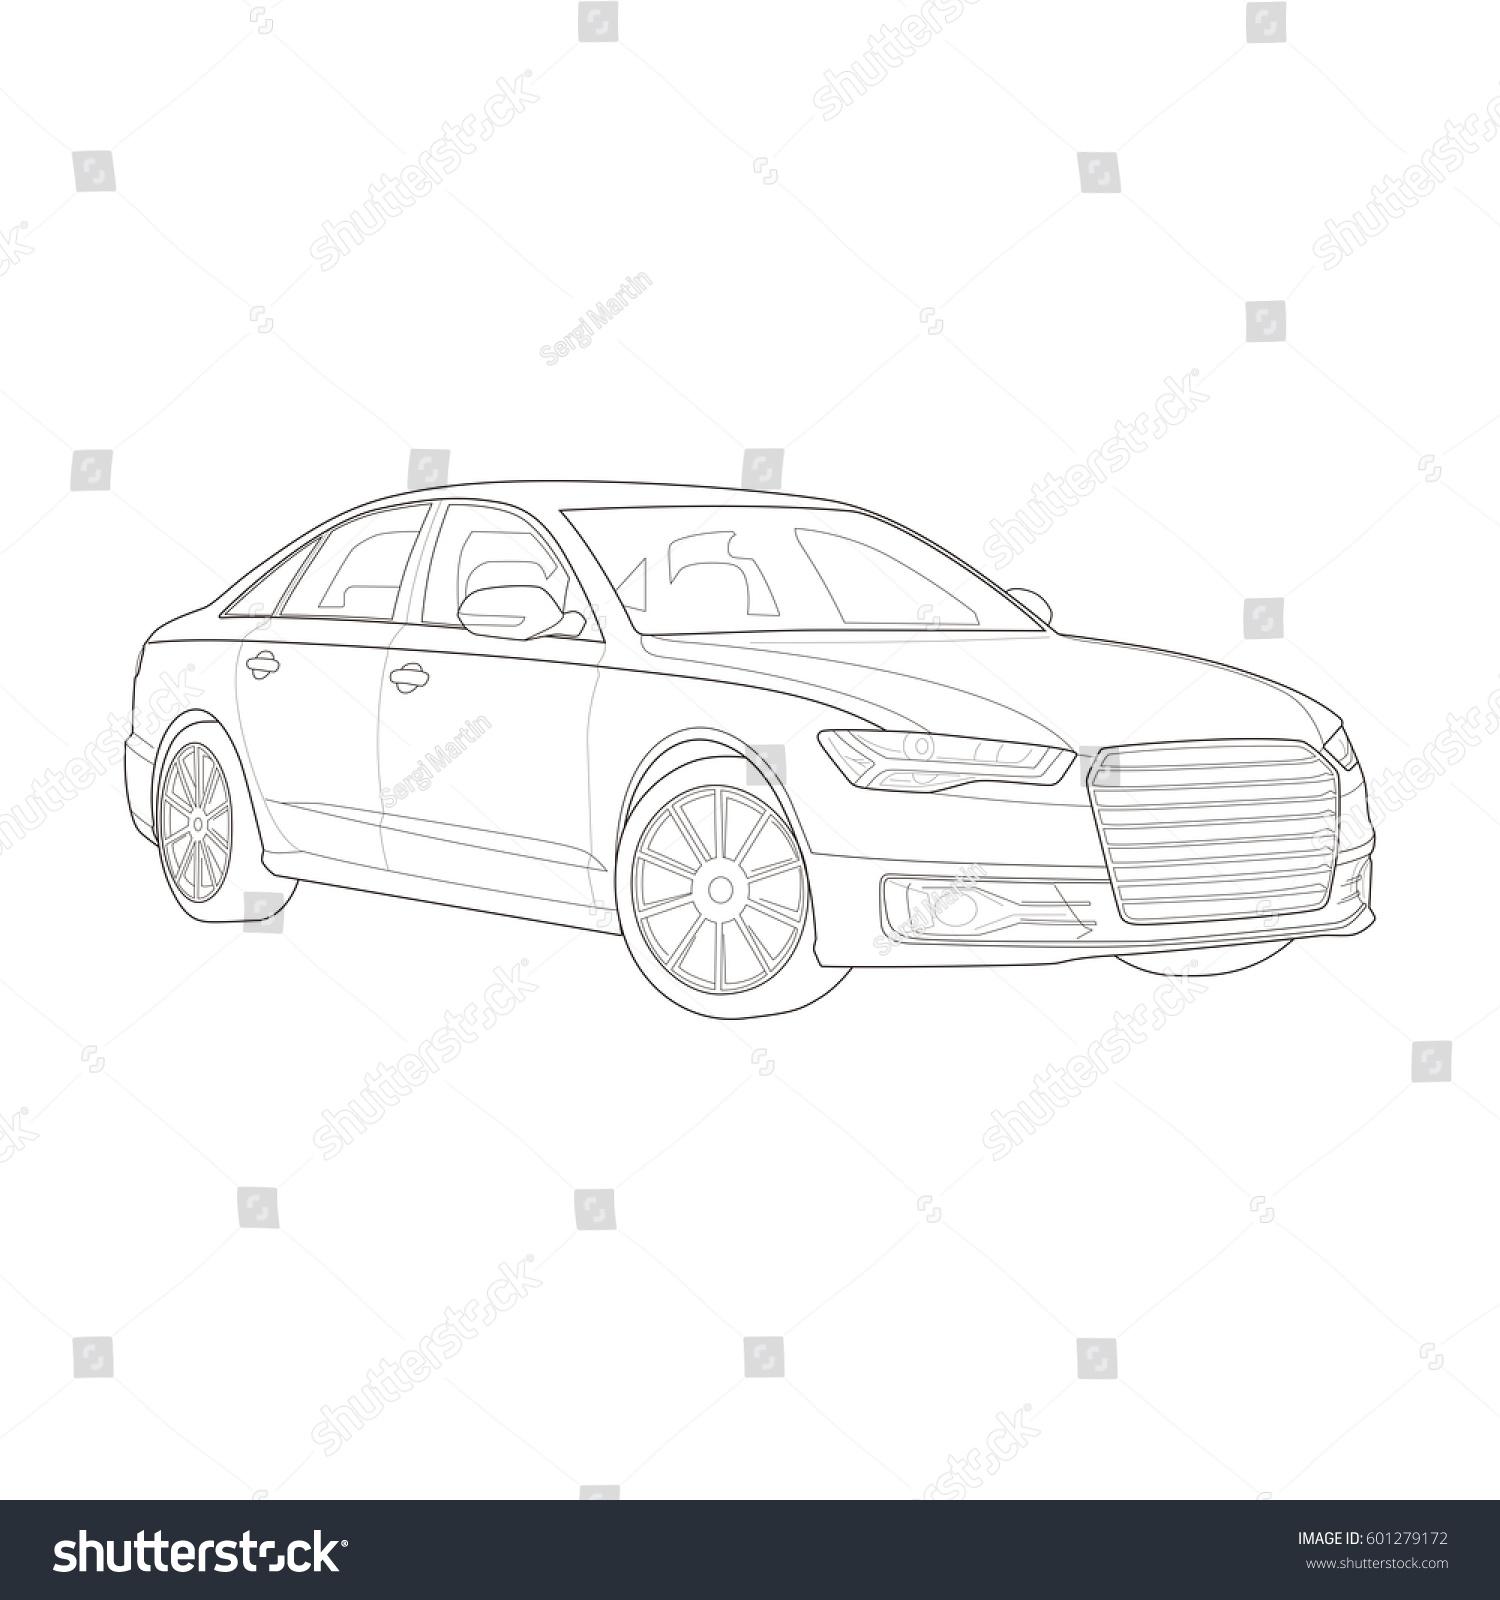 Technical Drawing Highend Car Vector Illustration Stock Vector ...